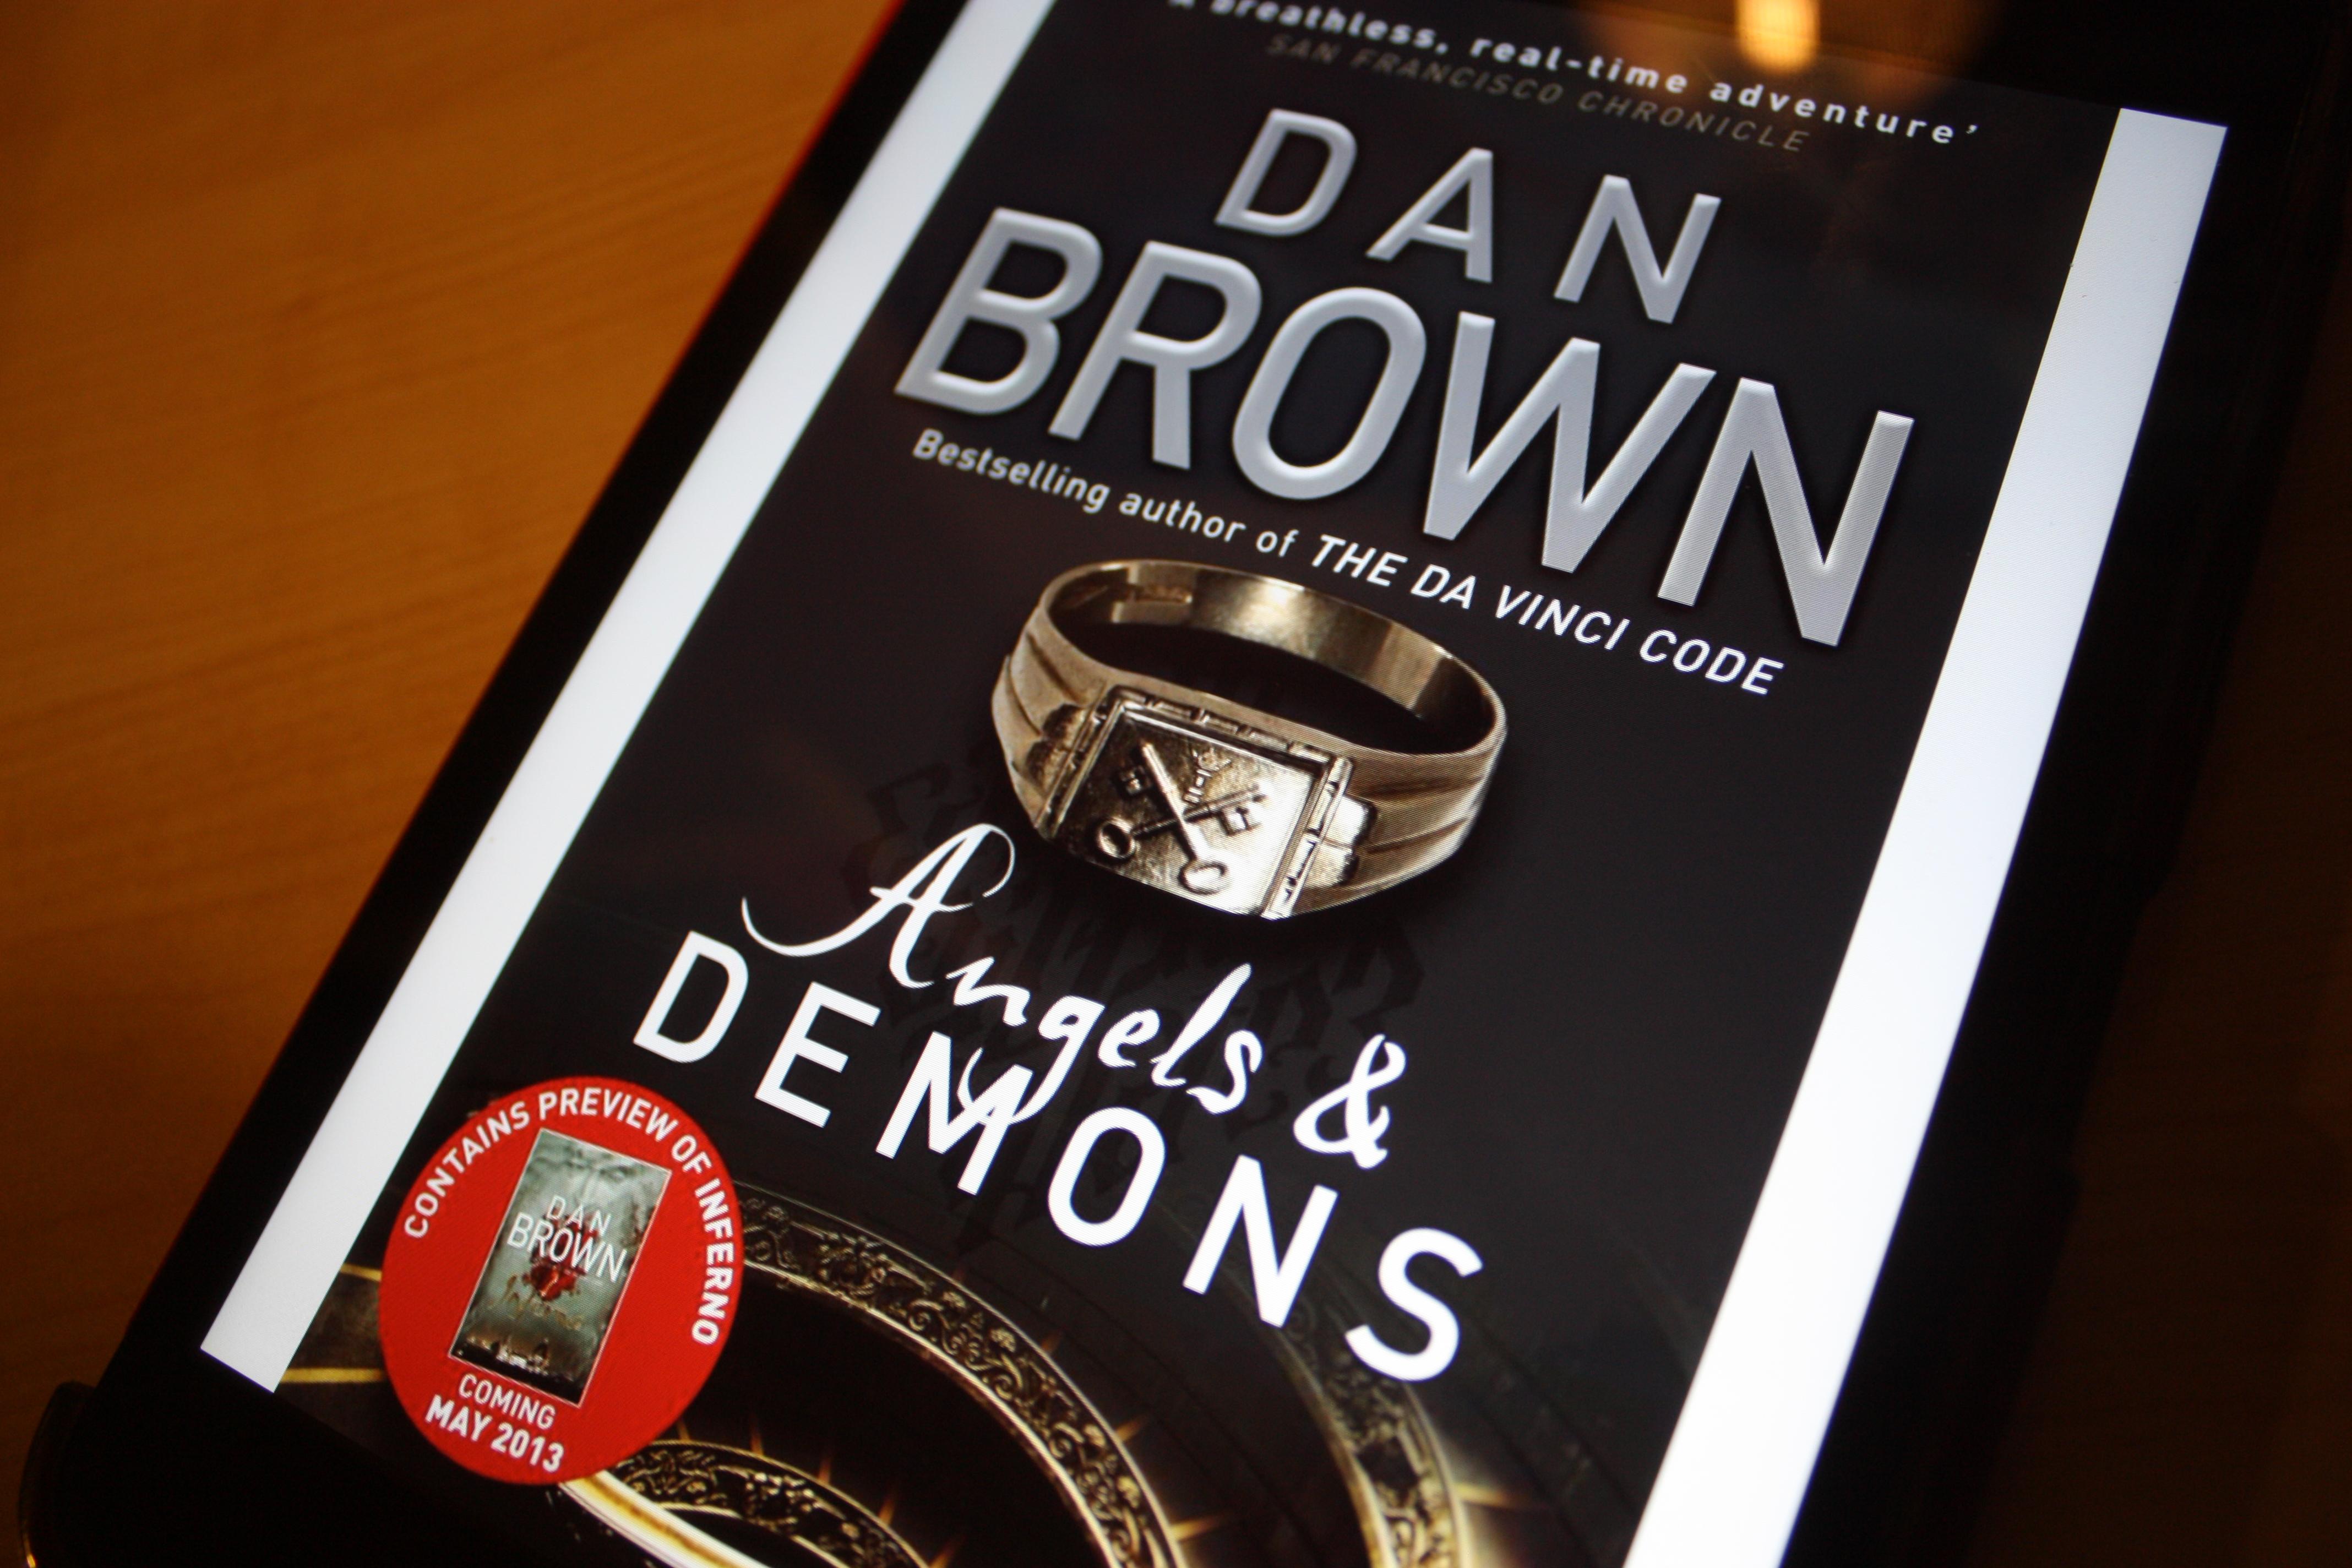 Angels and Demons (Robert Langdon #1) by Dan Brown